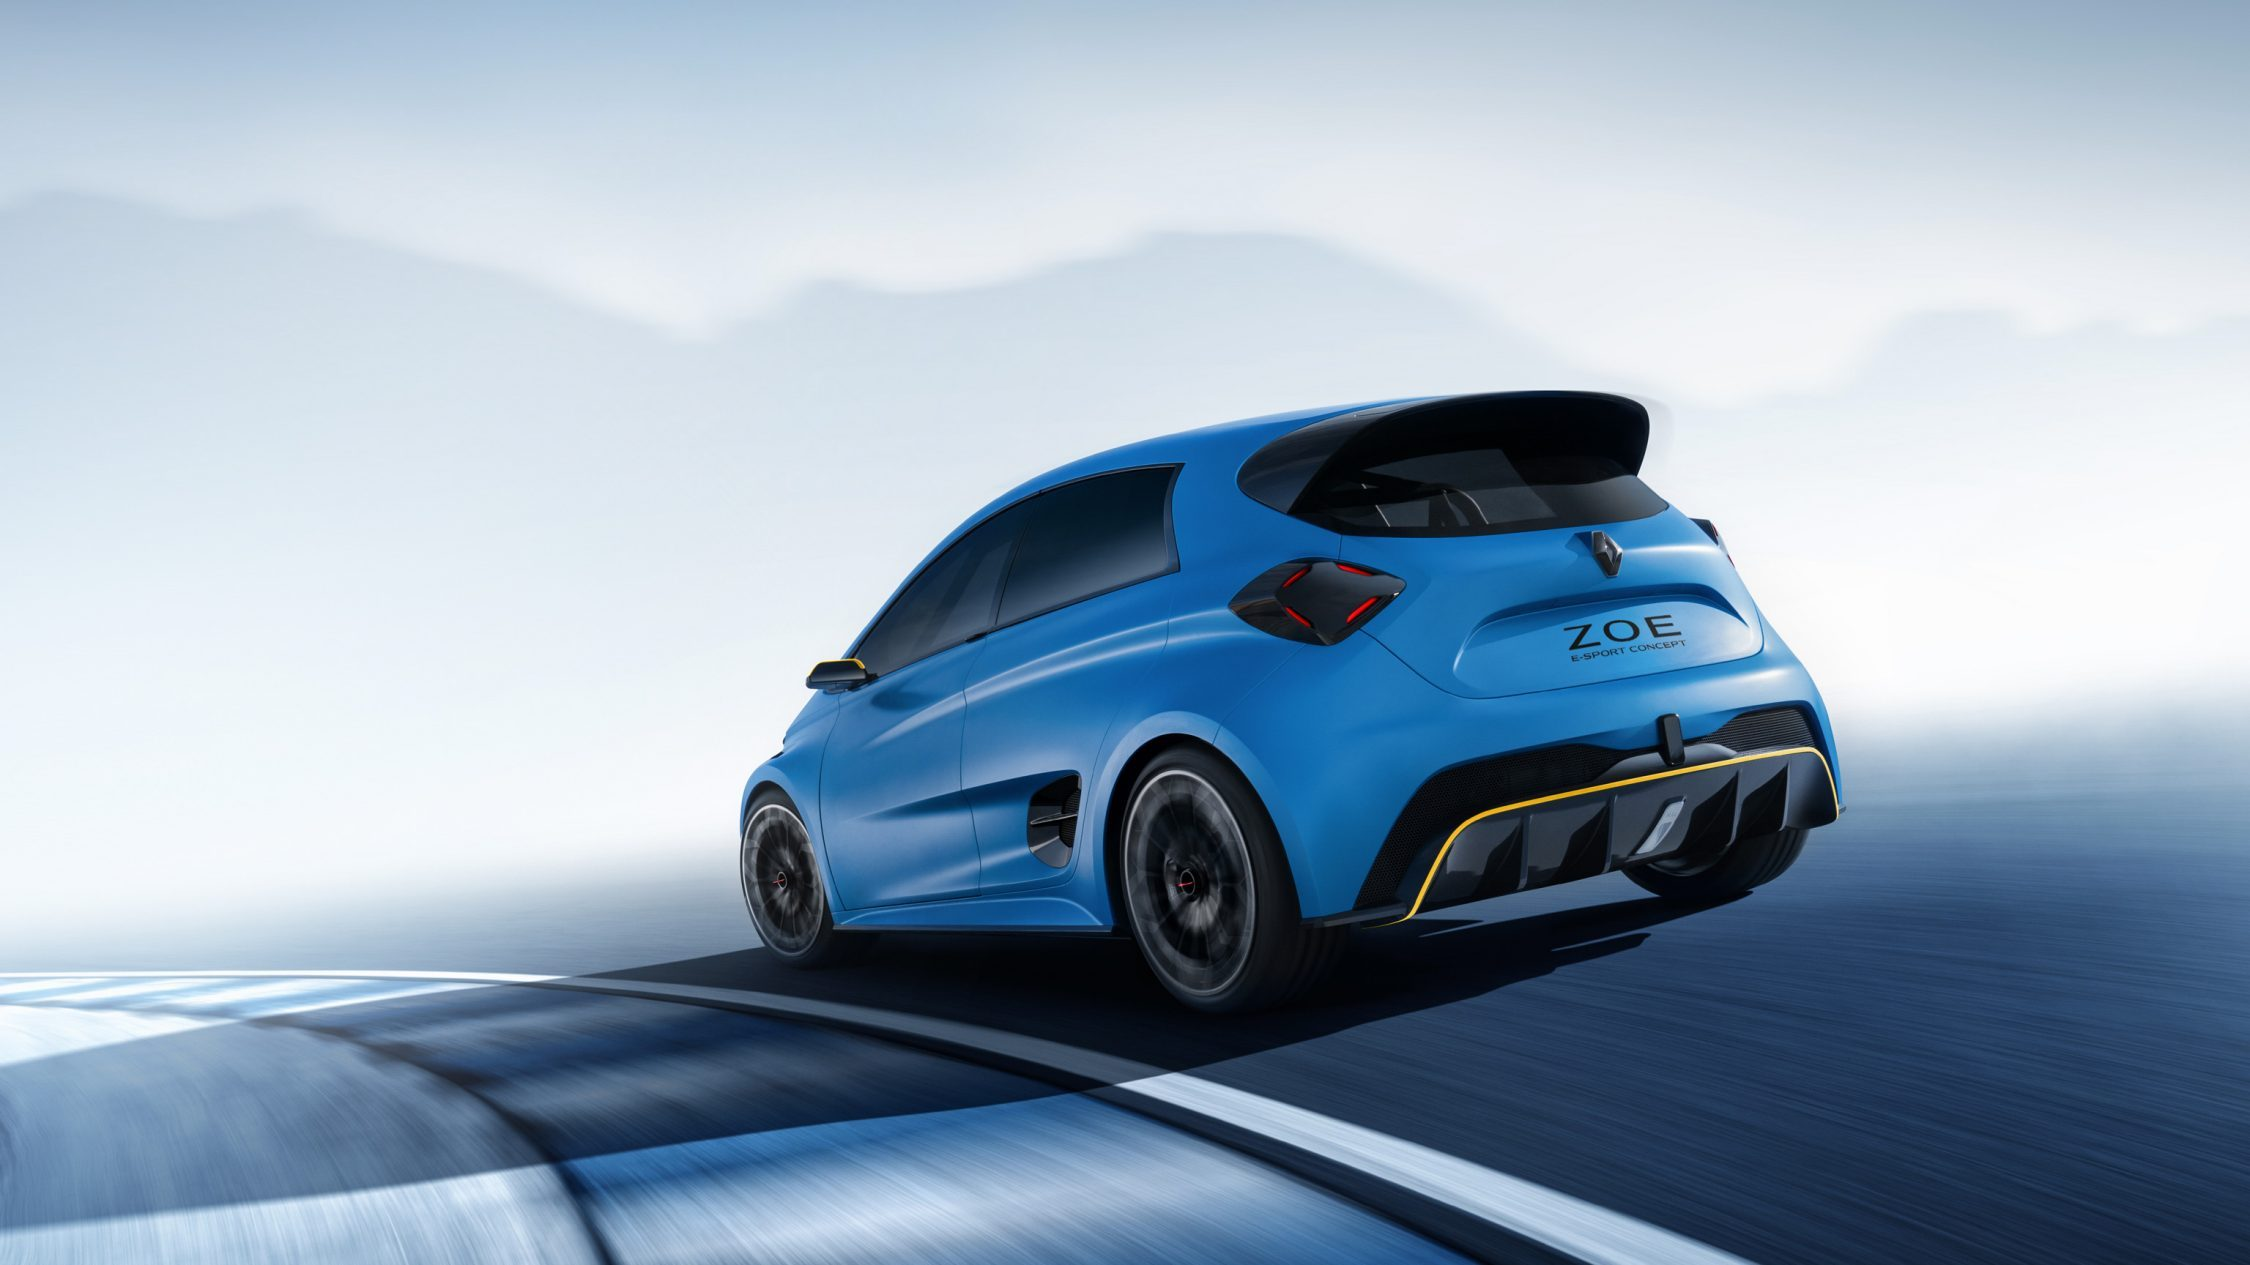 Renault ZOE e-Sport Concept la version sportive de la Renault ZOE